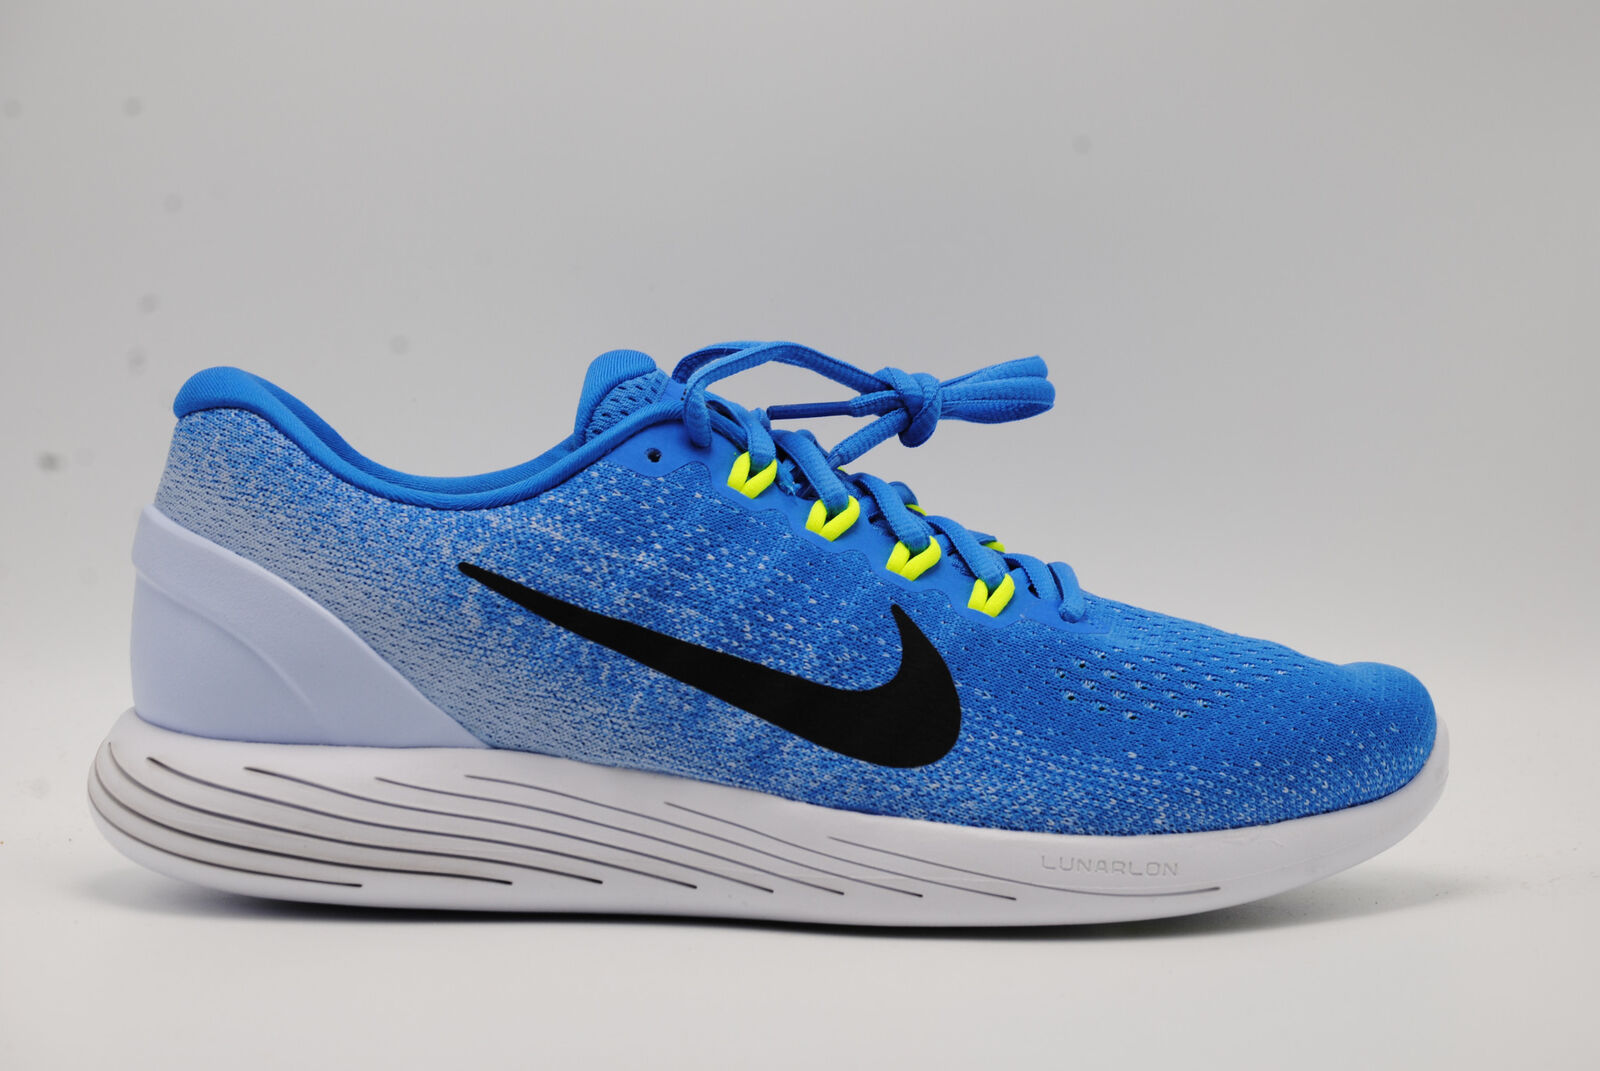 3007bd26344c Nike Lunarglide 9 Mens 904715-401 Italy Hydrogen Blue Running Shoes ...